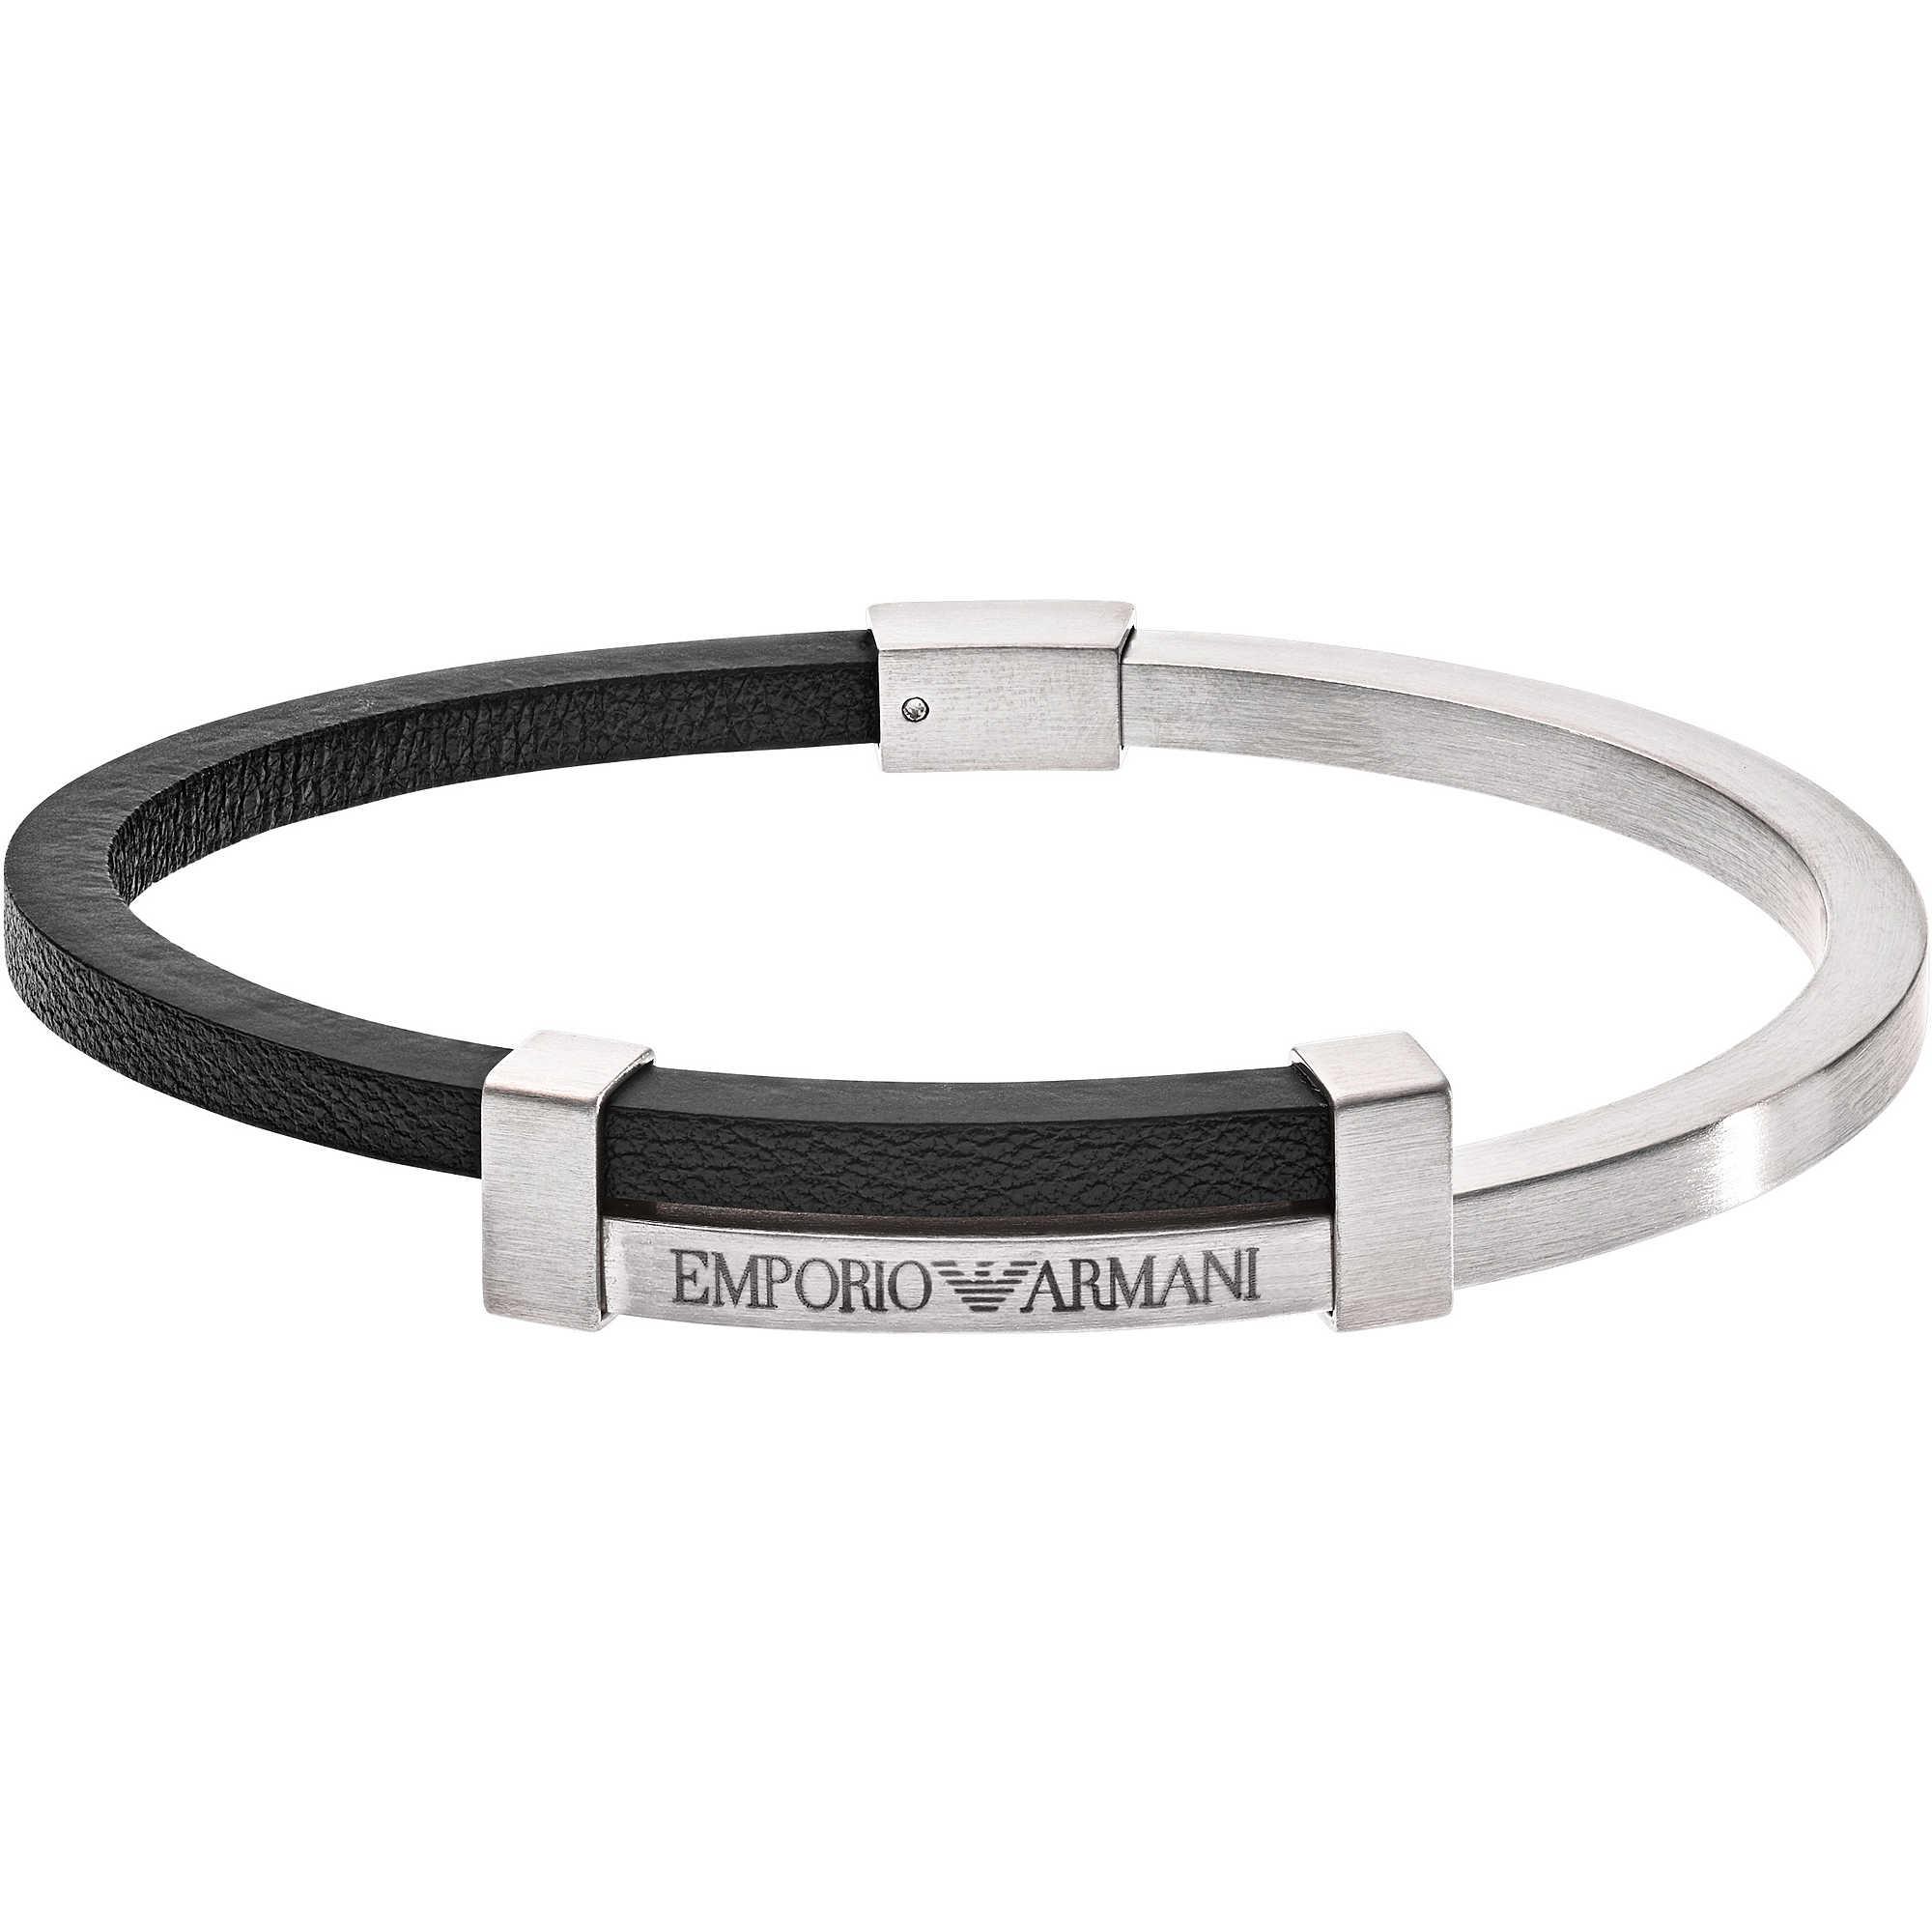 bracelet man jewellery Emporio Armani EGS2501040 bracelets Emporio ... c354a8fc315